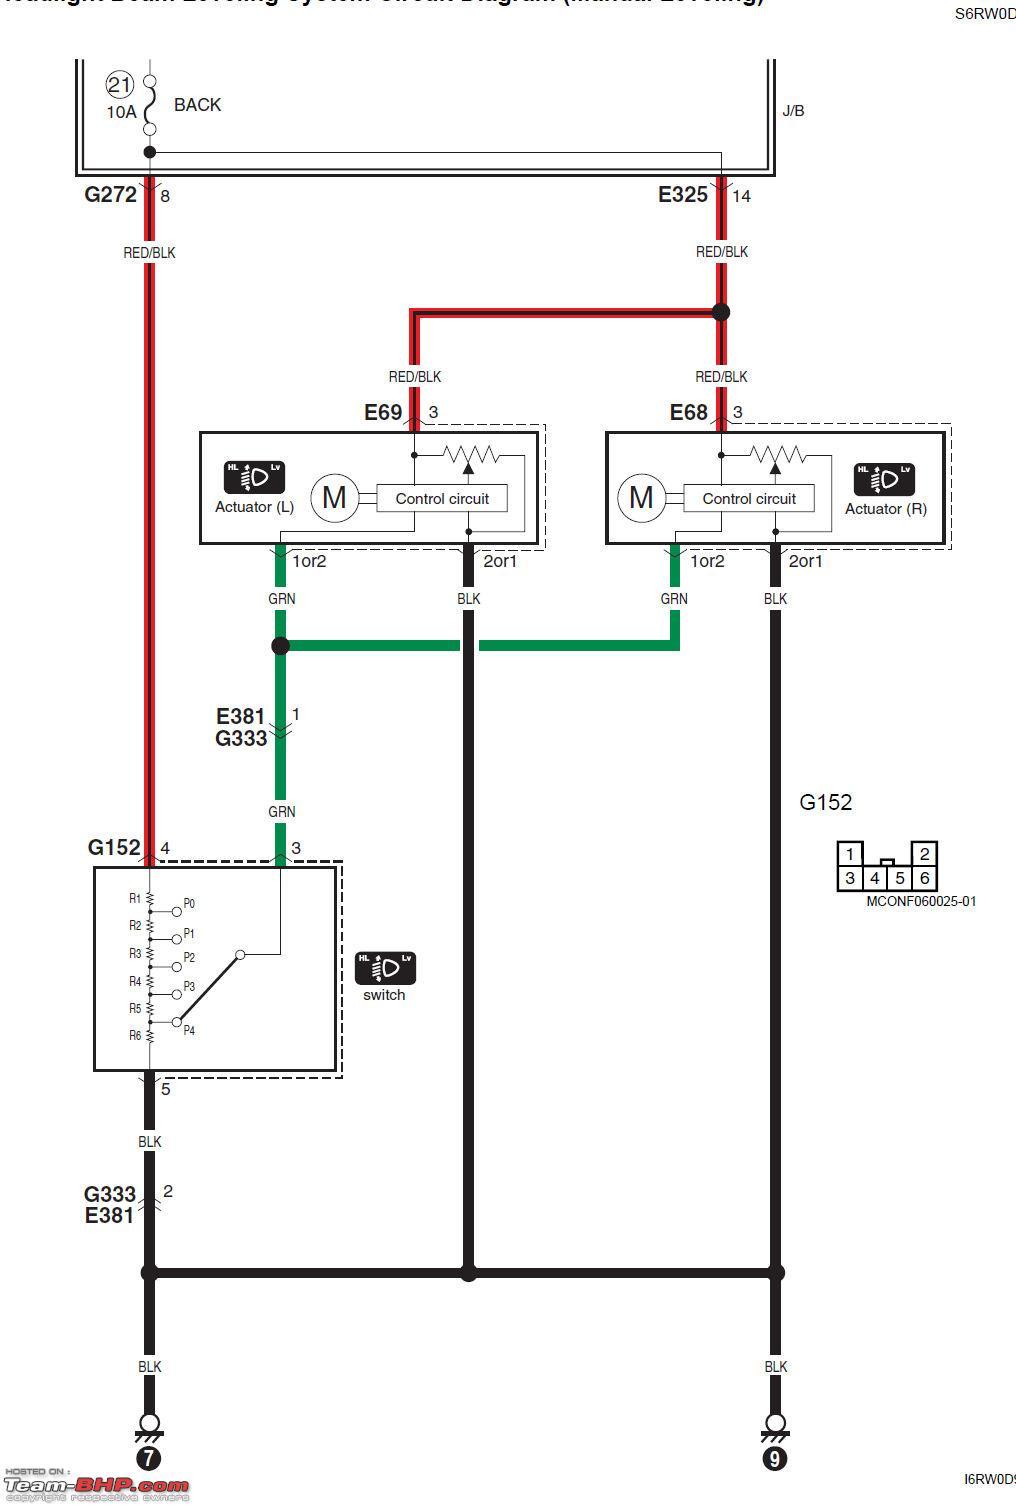 peugeot 407 wiring diagram 2002 saturn sl2 maruti celerio diy - fog lights and drl installation team-bhp